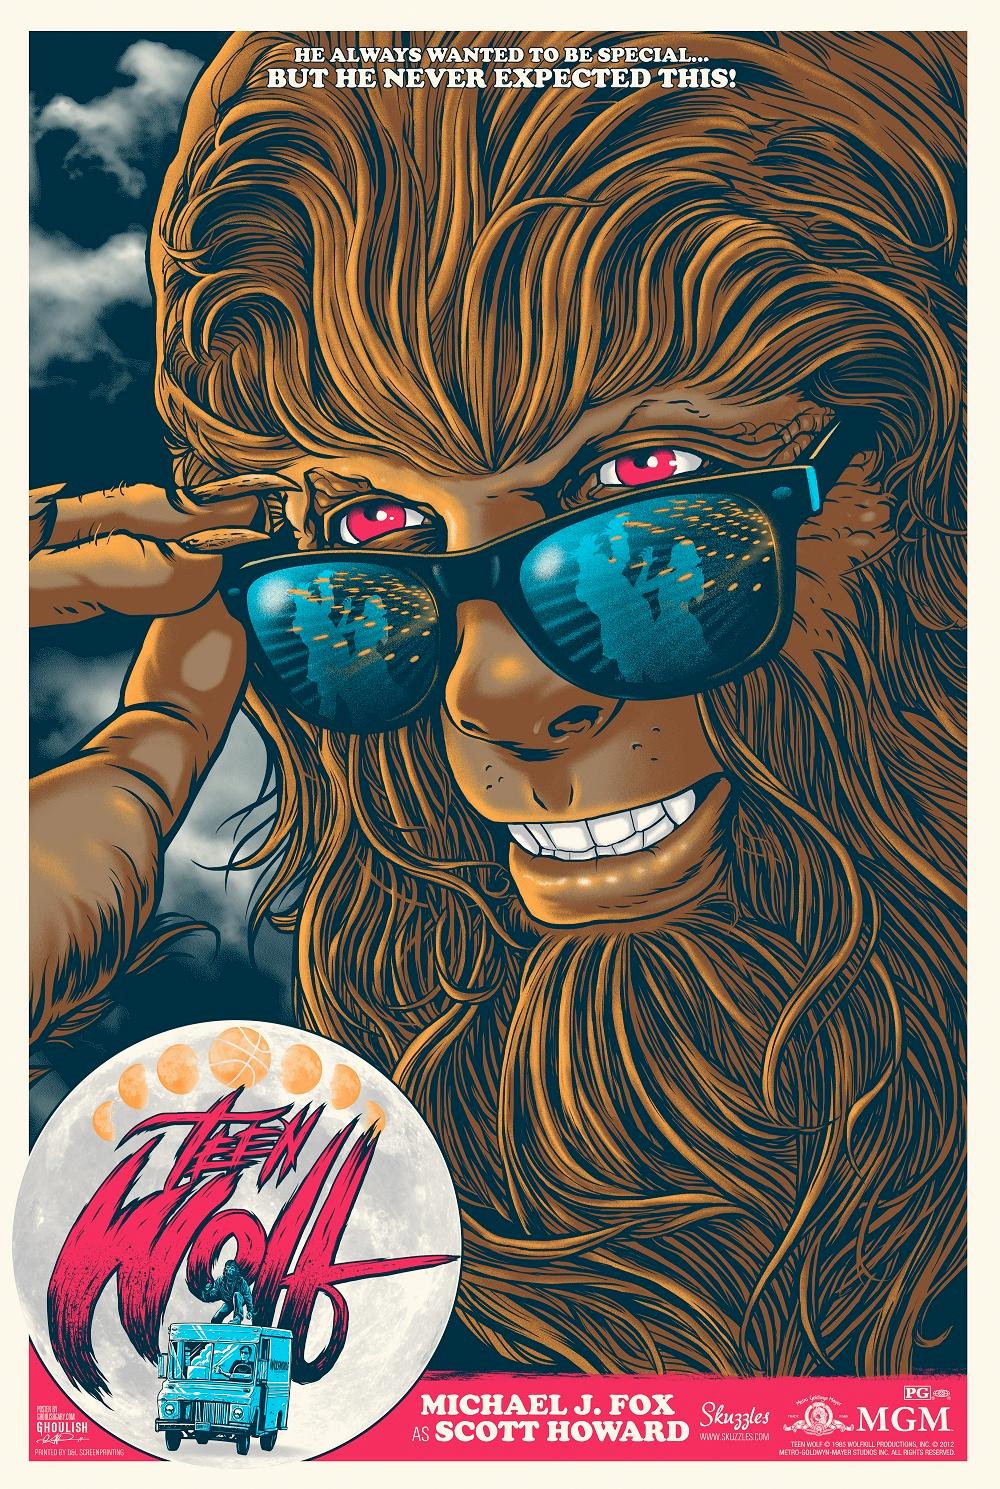 Ghoulish Gary Pullin - Teen Wolf